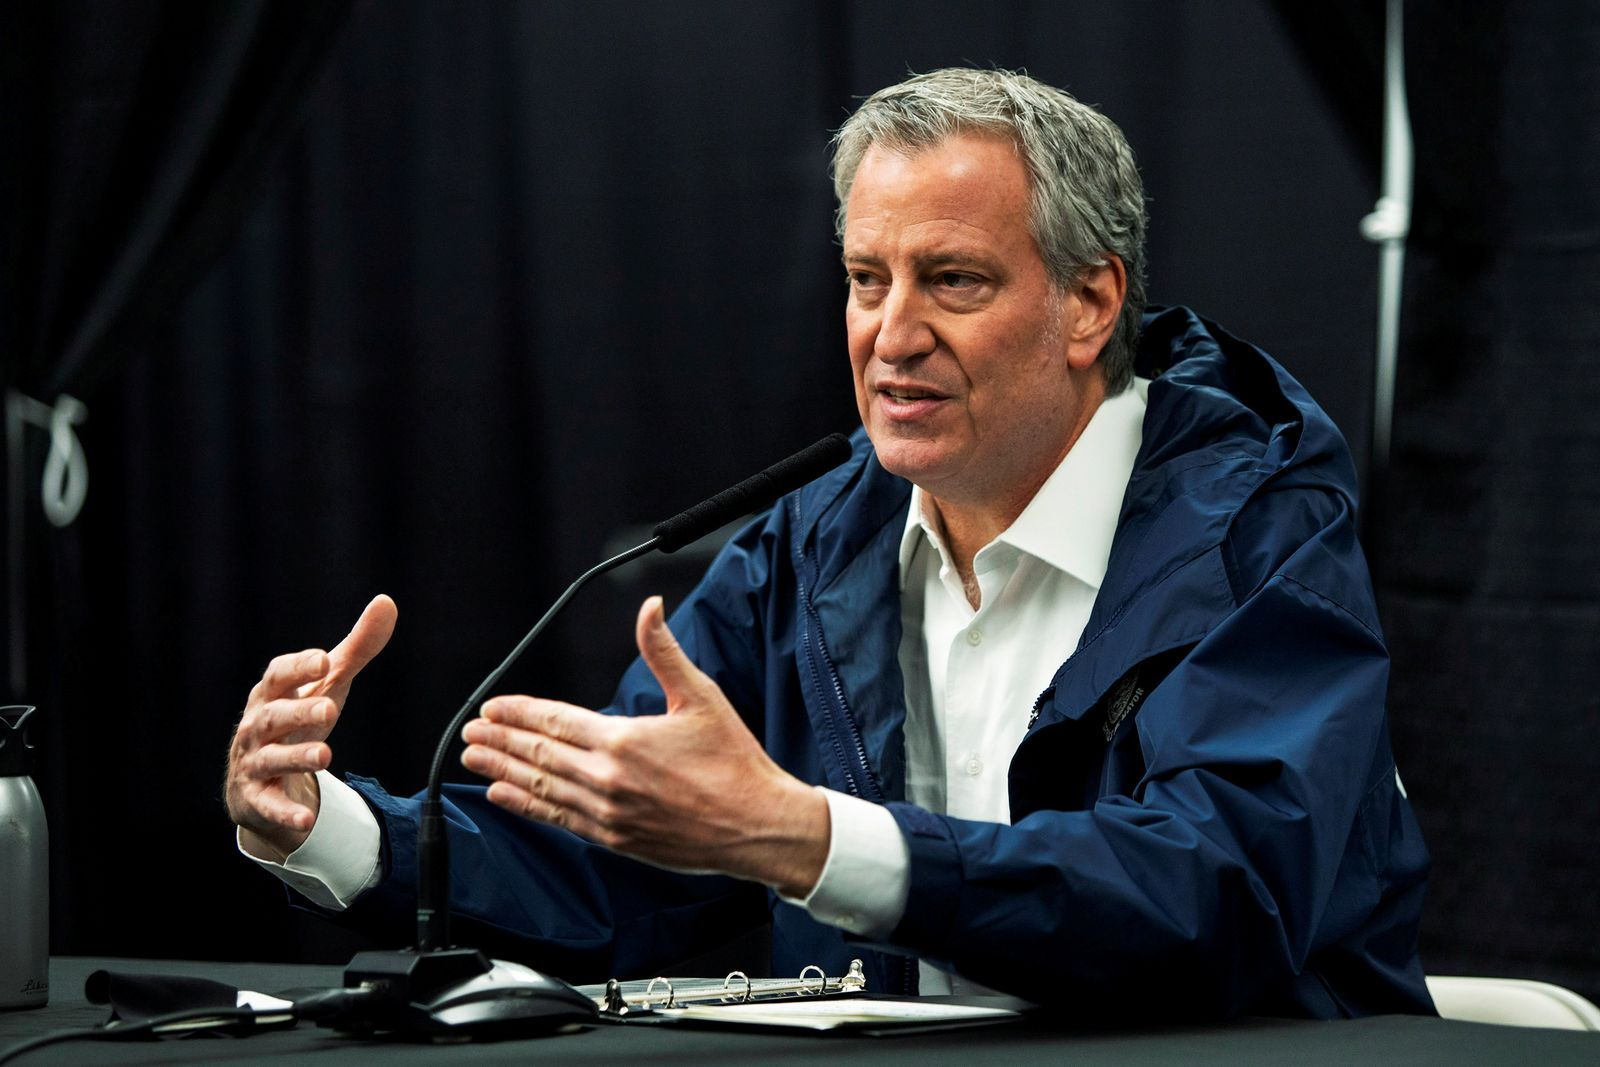 FILE PHOTO: New York City Mayor Bill De Blasio speaks to the media